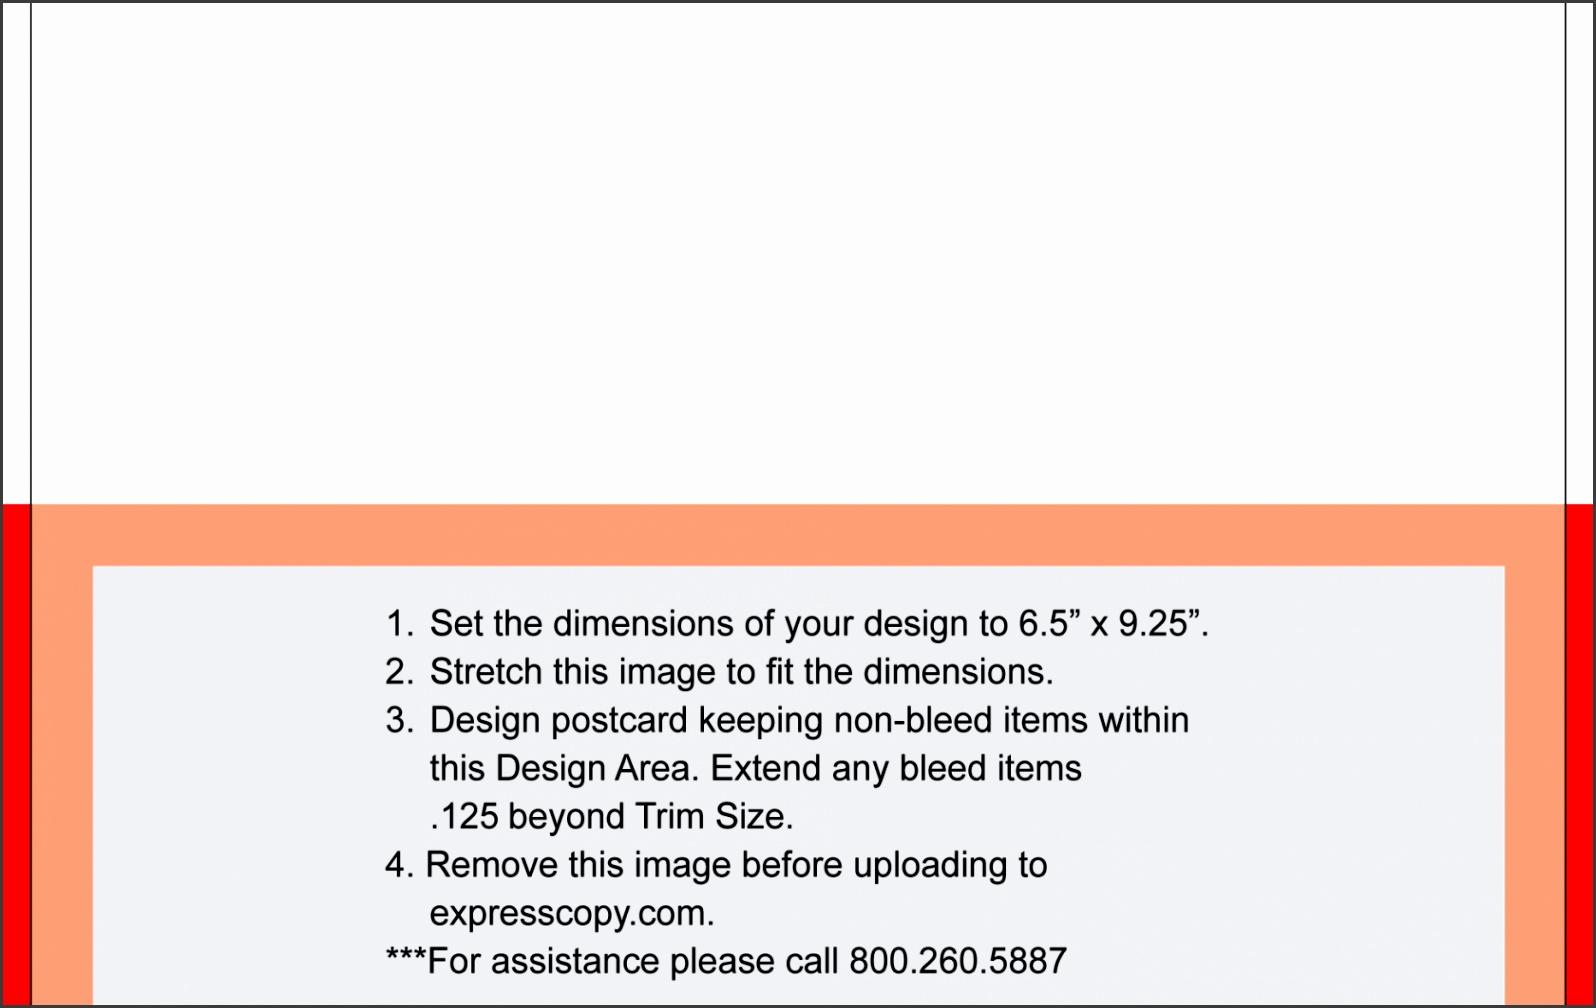 Business card size template word illustrator psd microsoft business card print template illustrator templatesz234 cards size